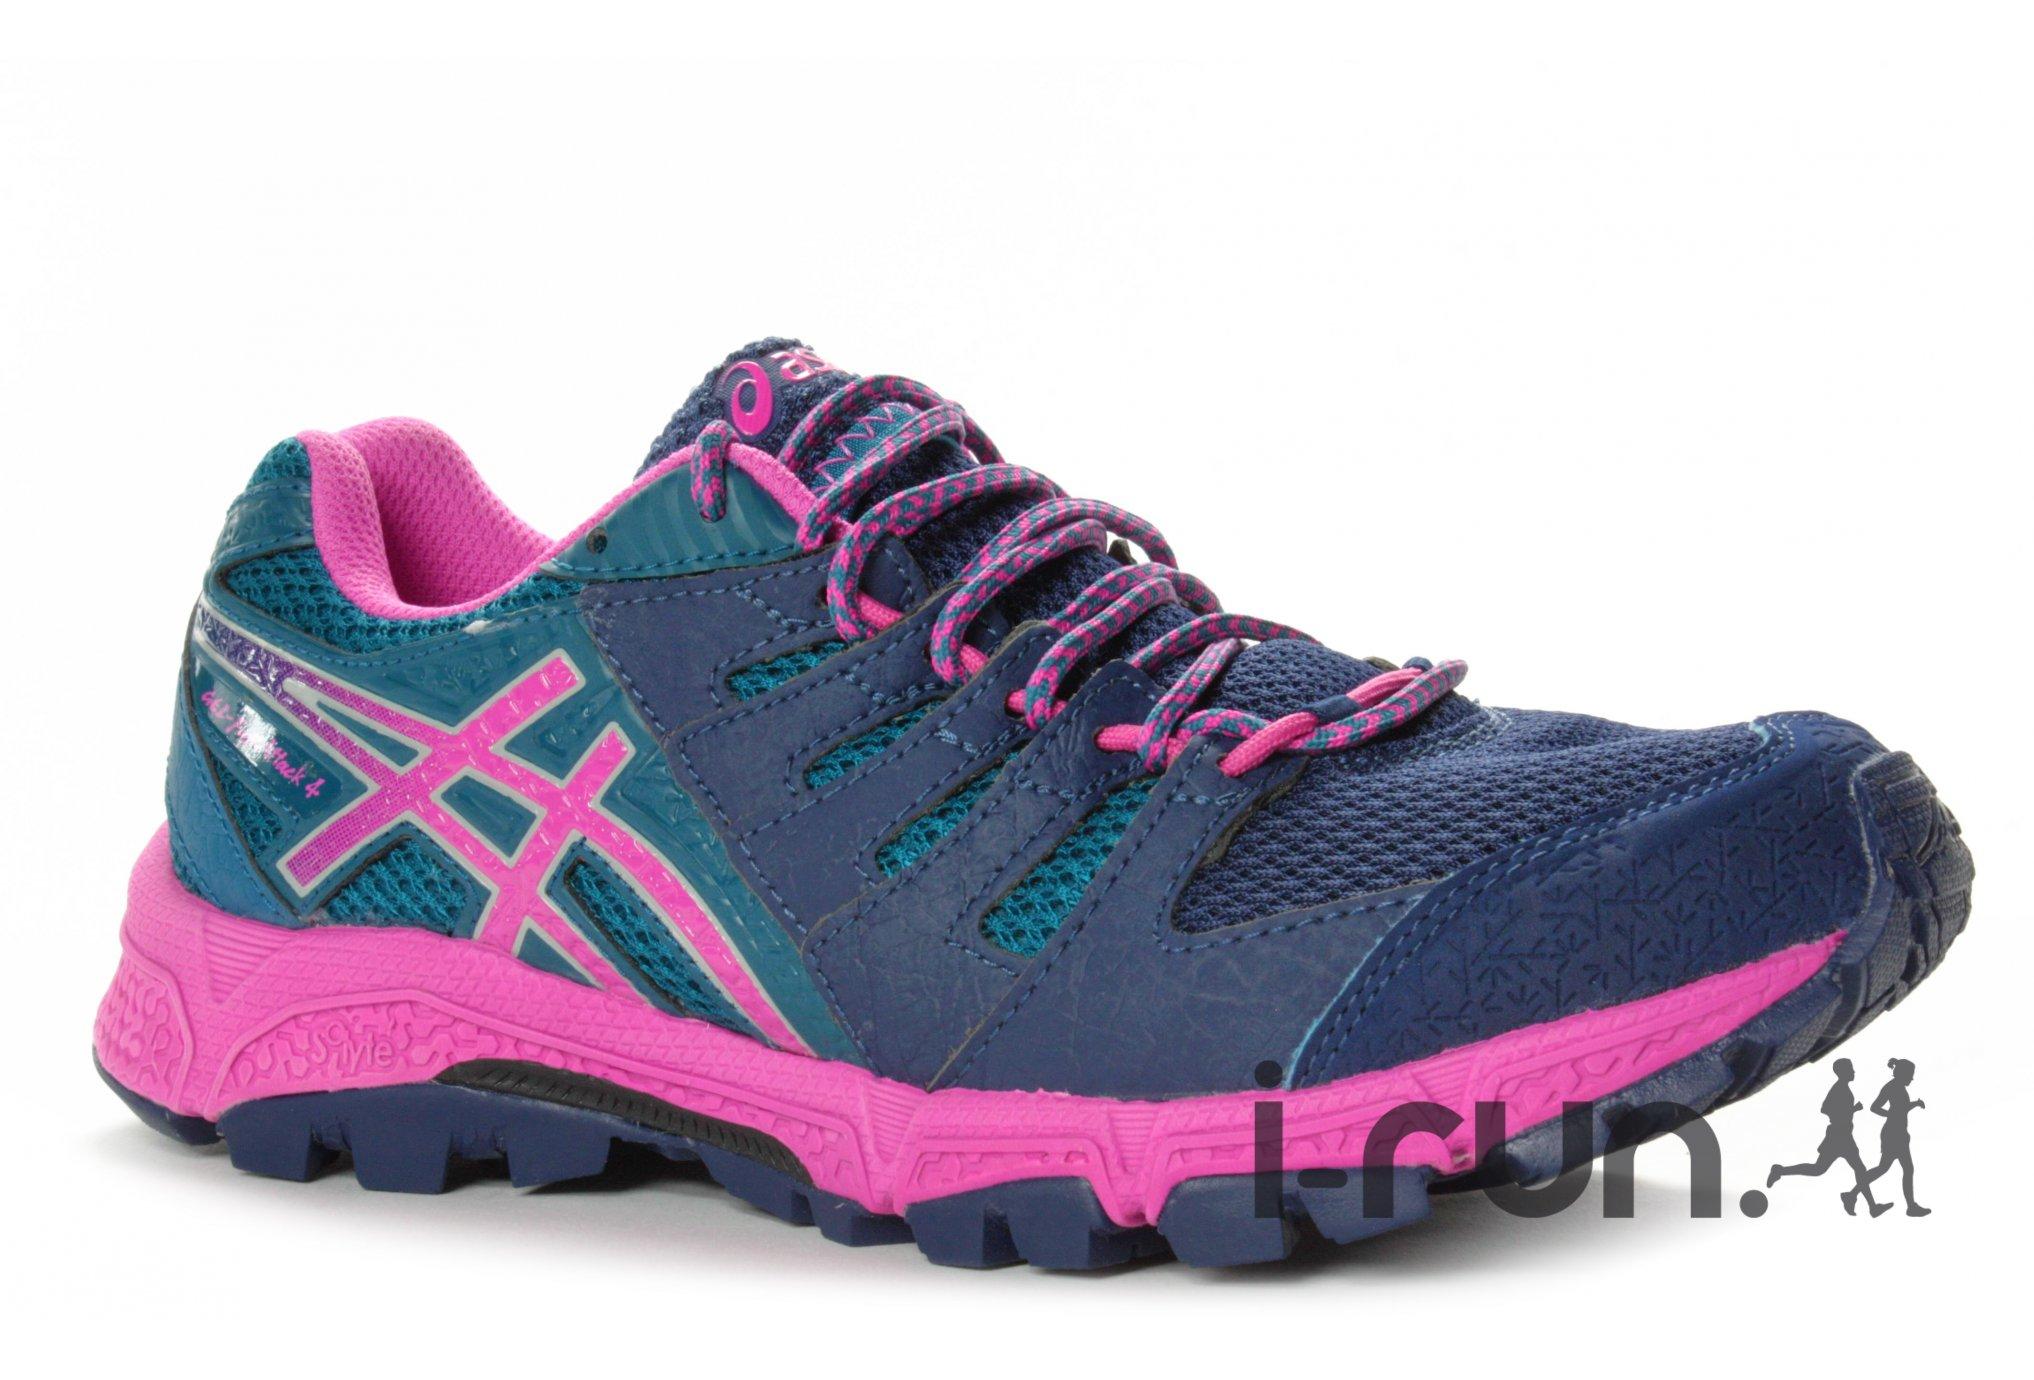 Asics Gel-Fuji attack 4 w diététique chaussures femme